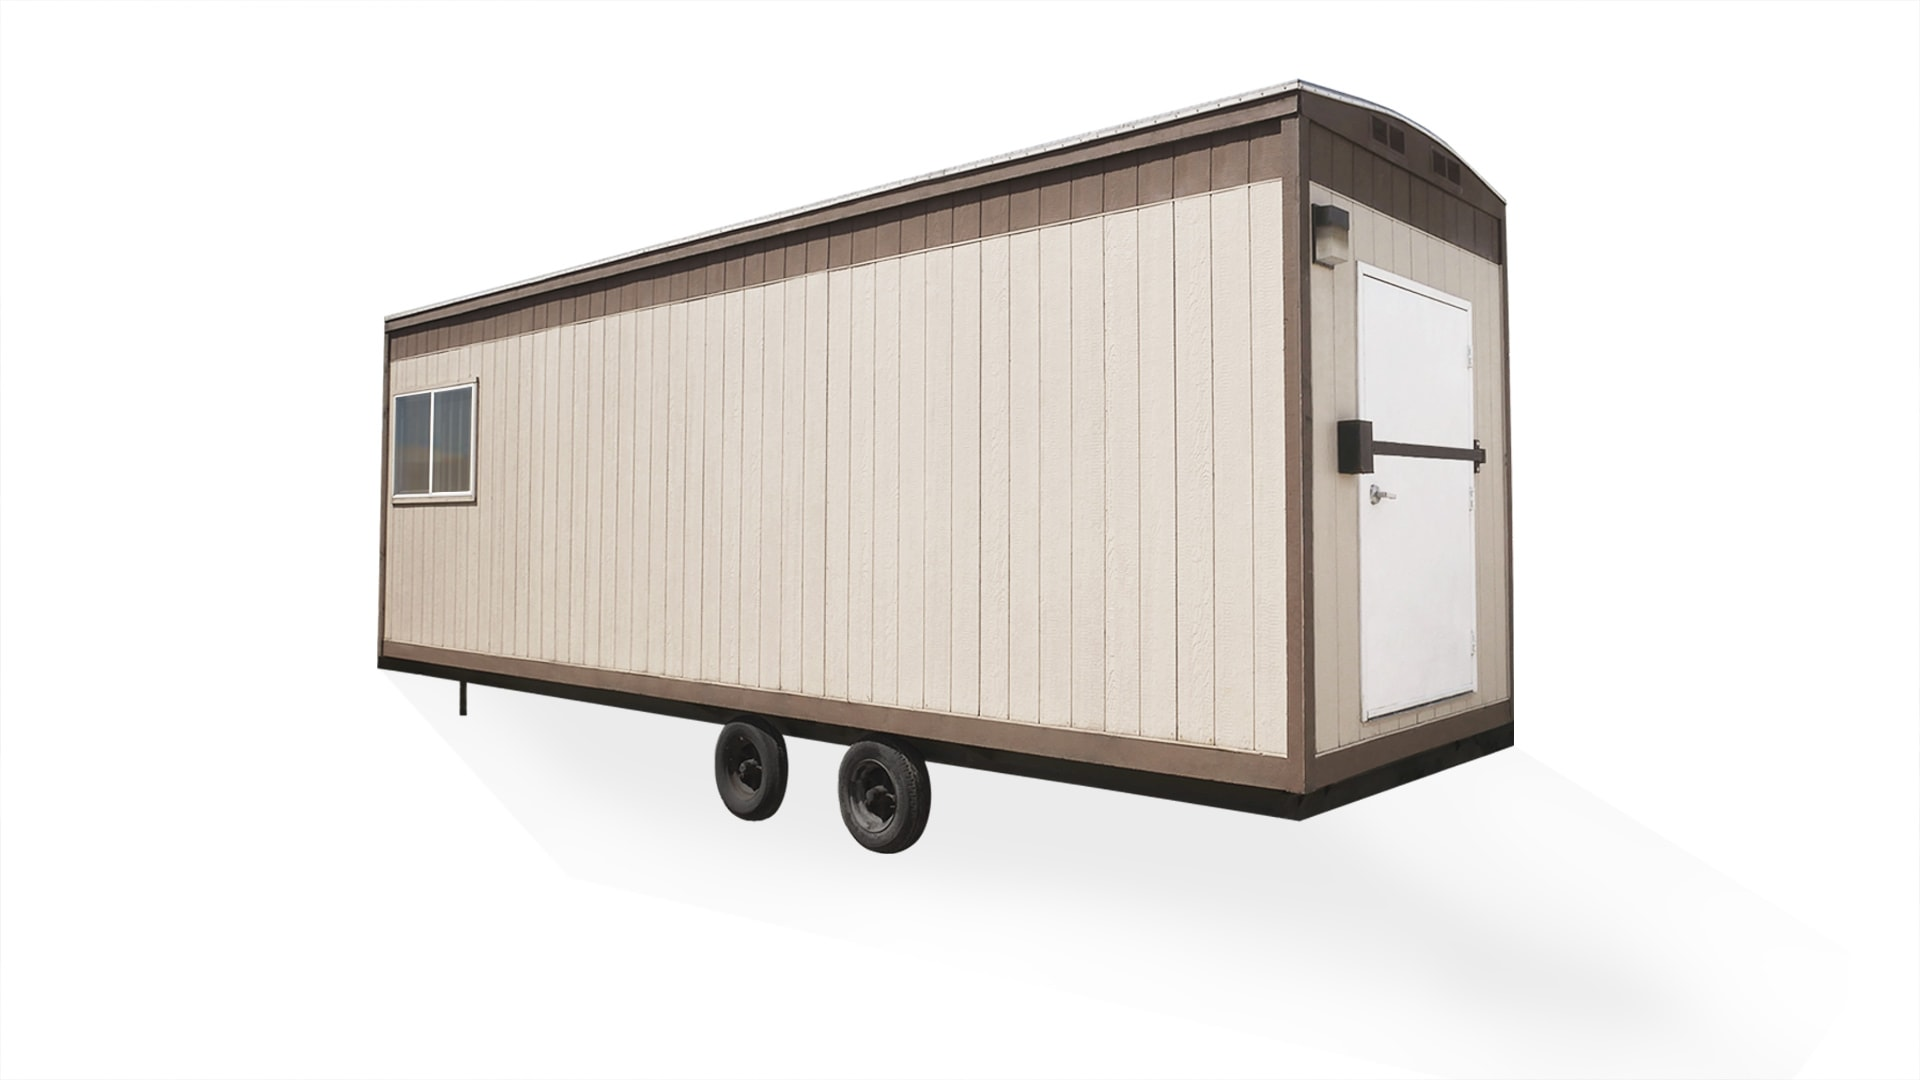 Mobile Office Trailer Exterior